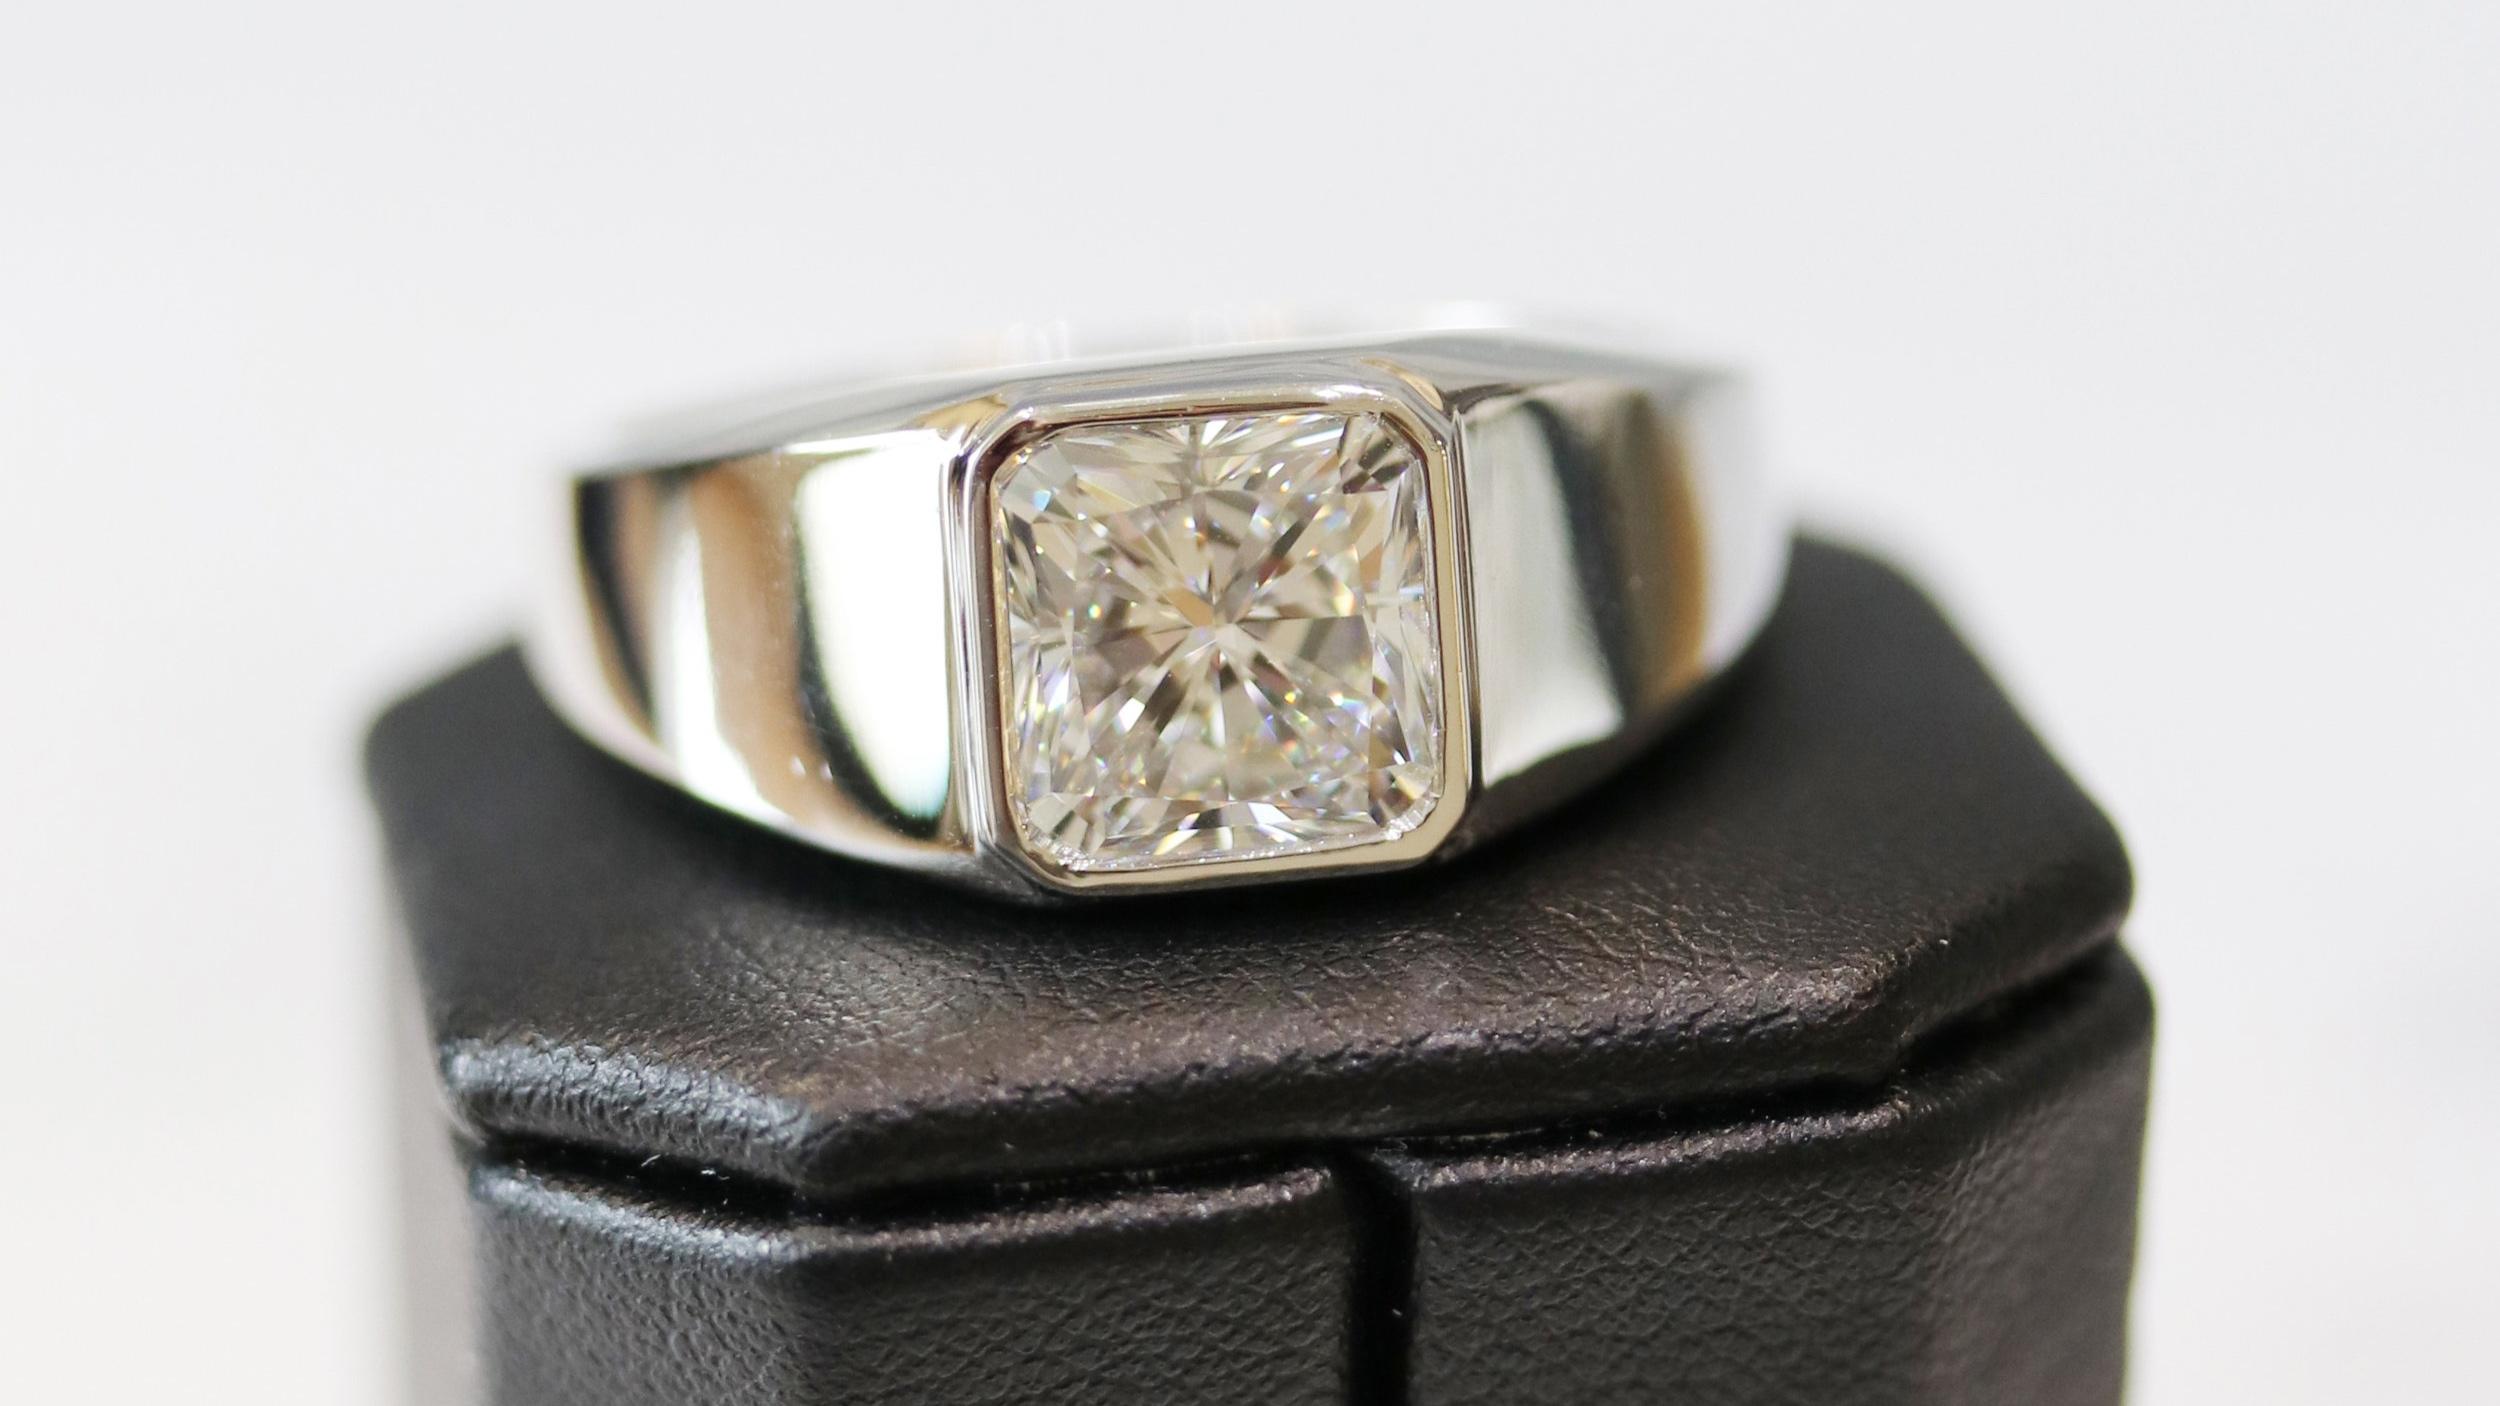 Men's Bezel Set Ring in Platinum Featuring a 4.37ct Radiant Cut center stone.